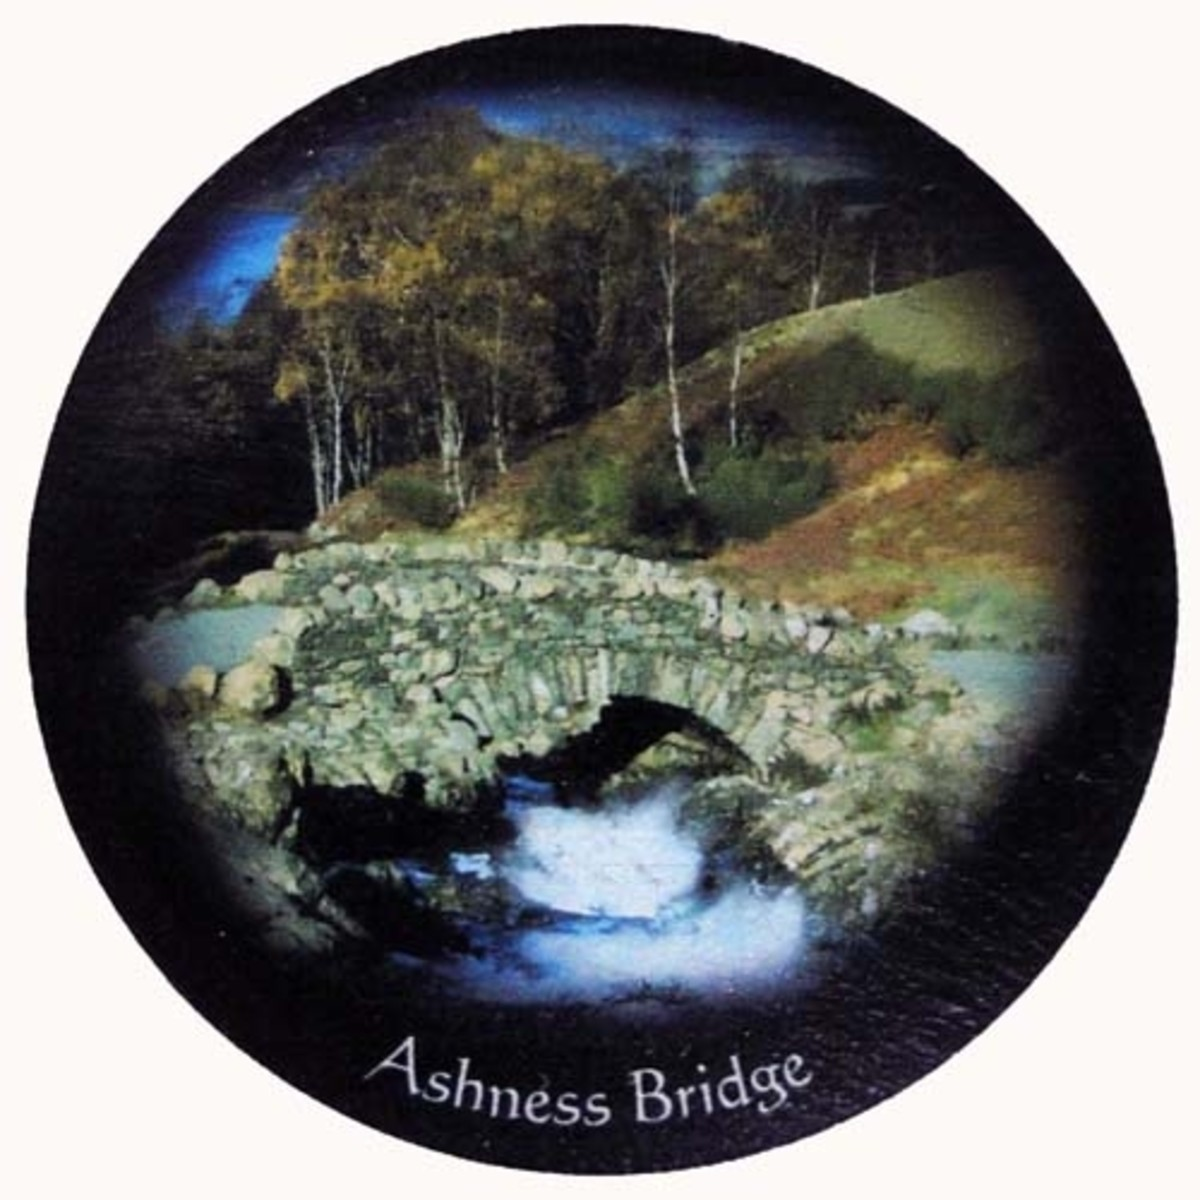 Slate coaster of Ashness Bridge, Lake District, England